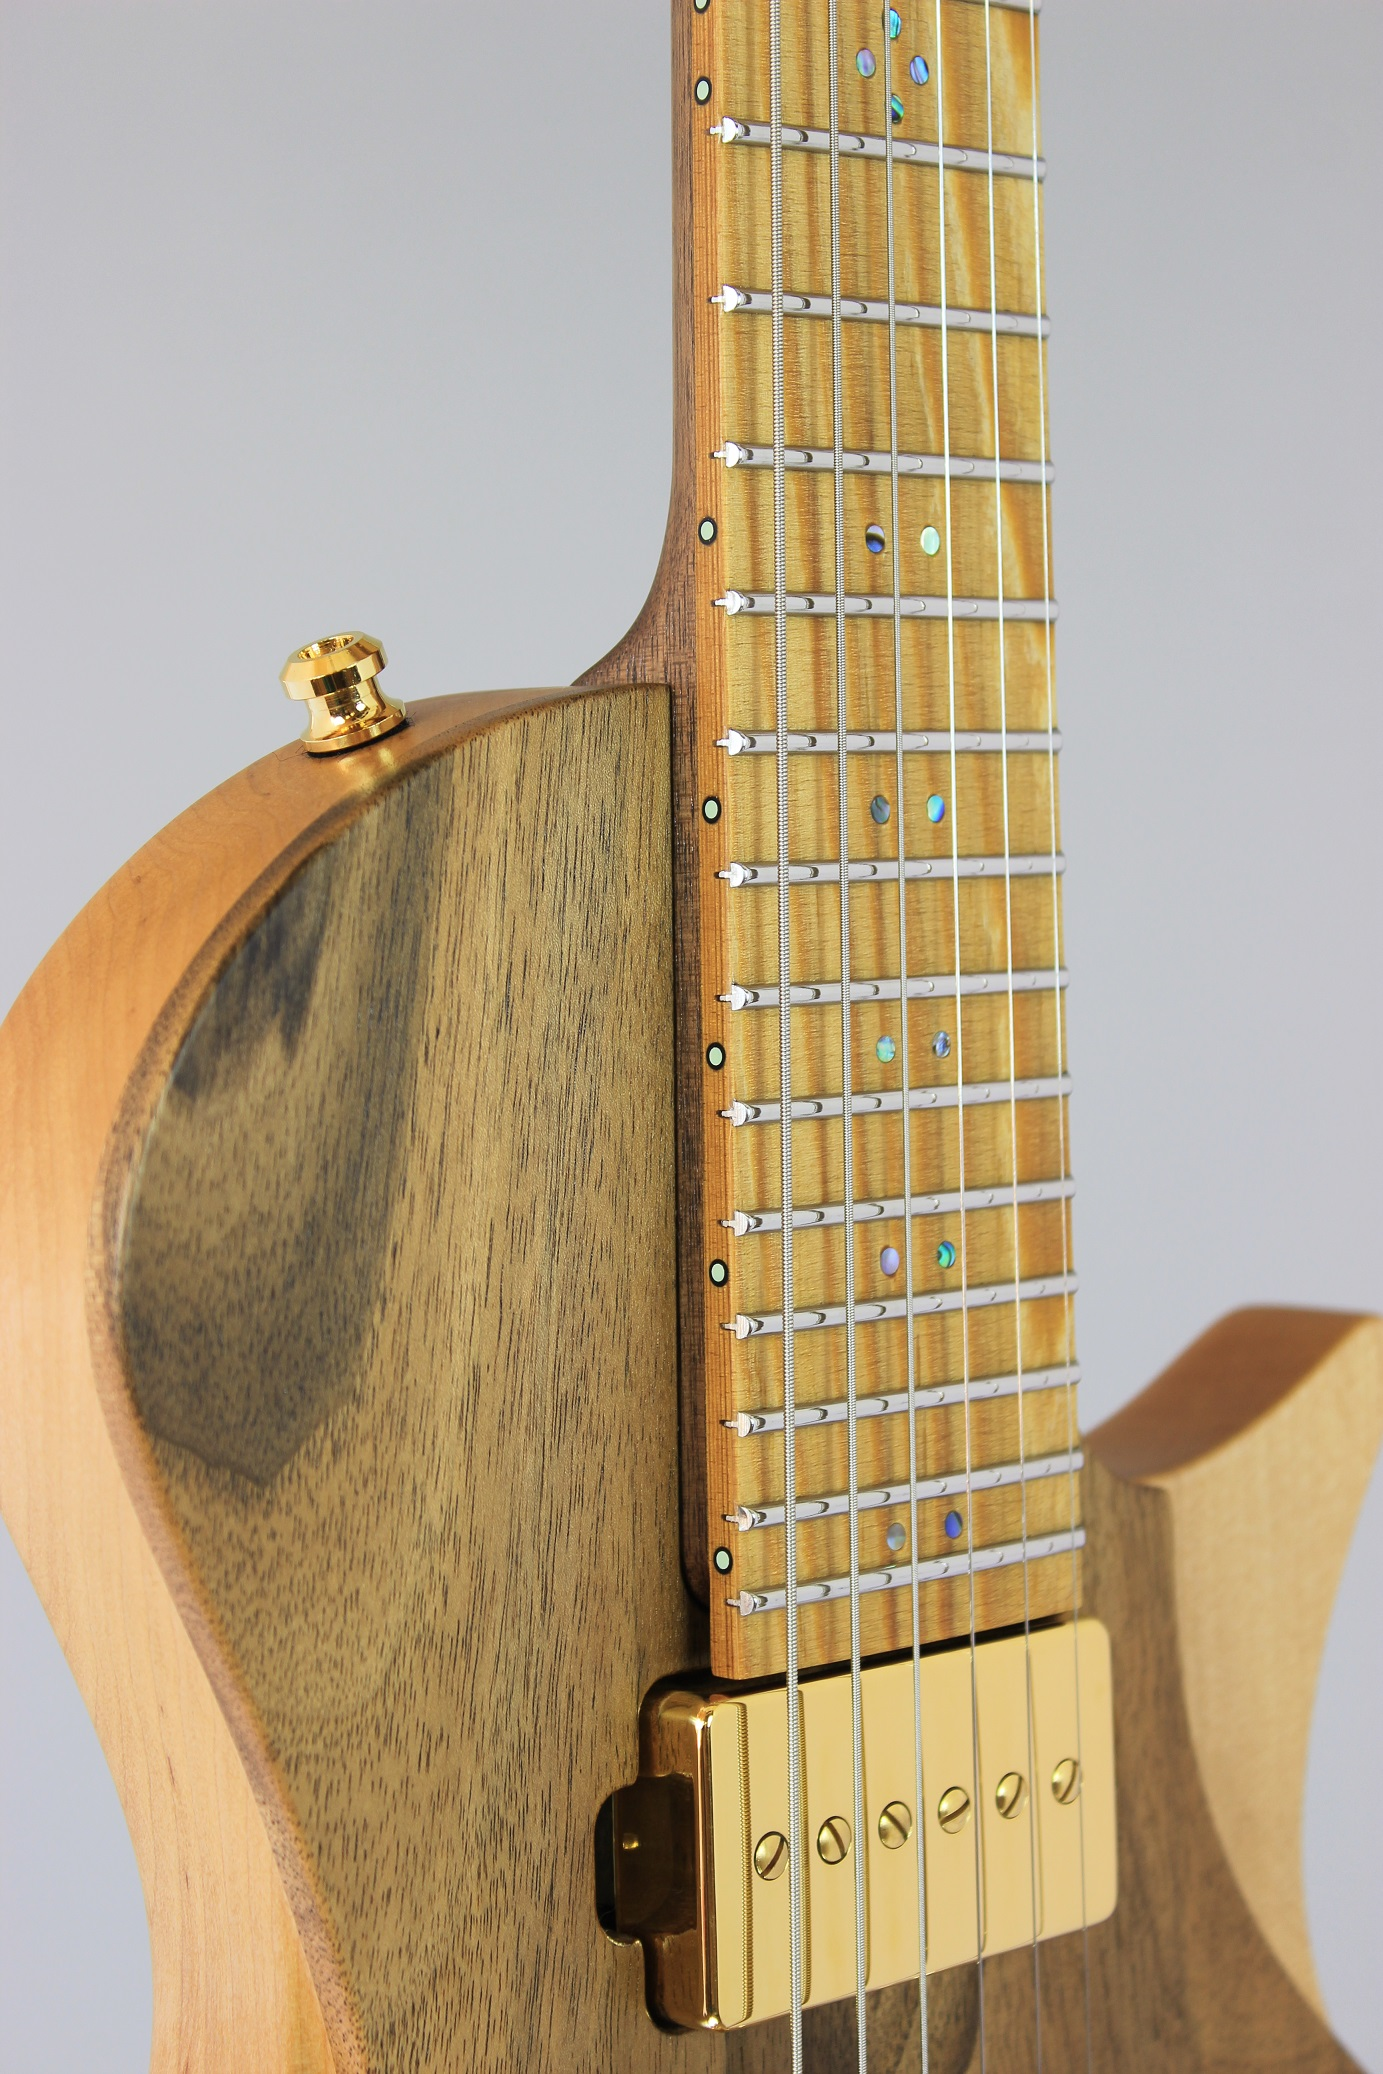 odem Gignera wit fretboard from Sonowood spruce